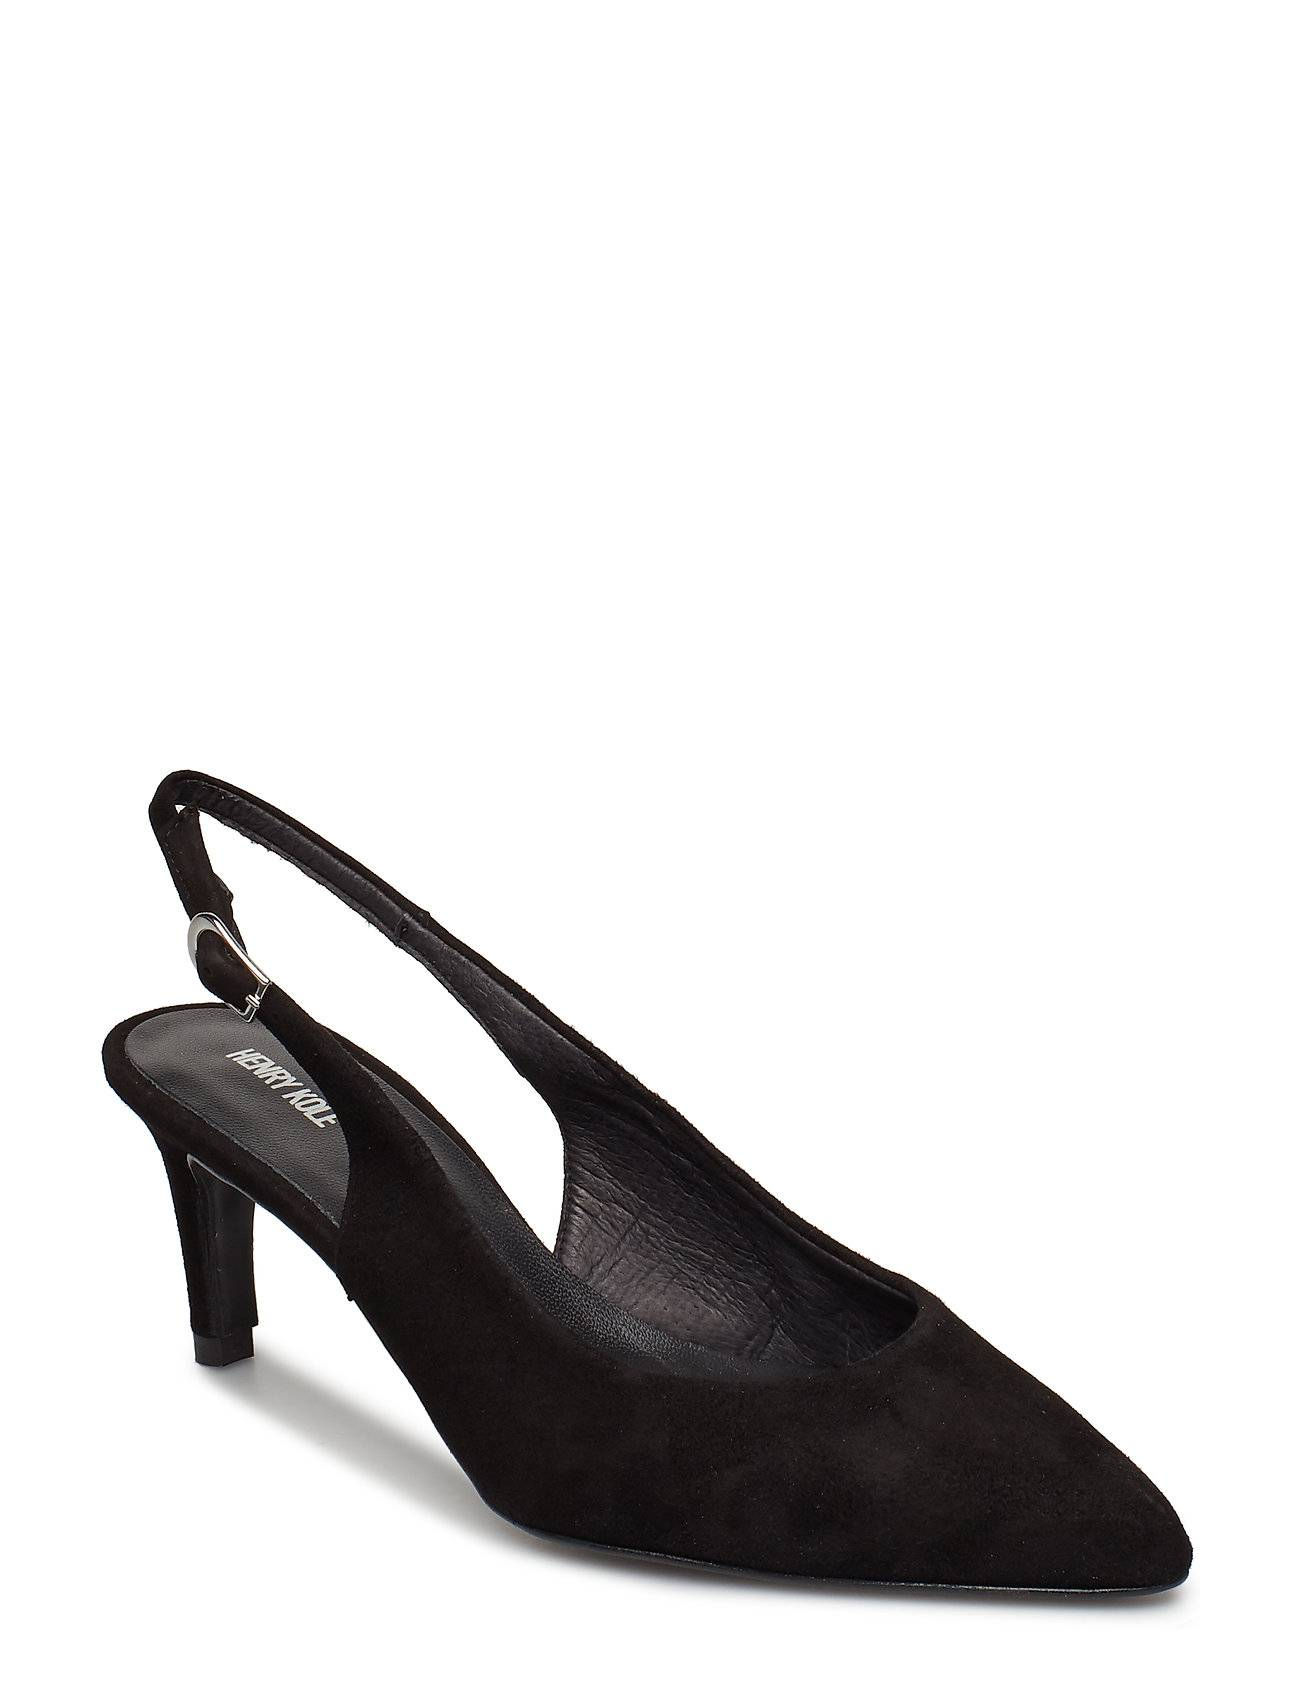 Henry Kole Lisa Suede Black Shoes Heels Pumps Sling Backs Musta Henry Kole